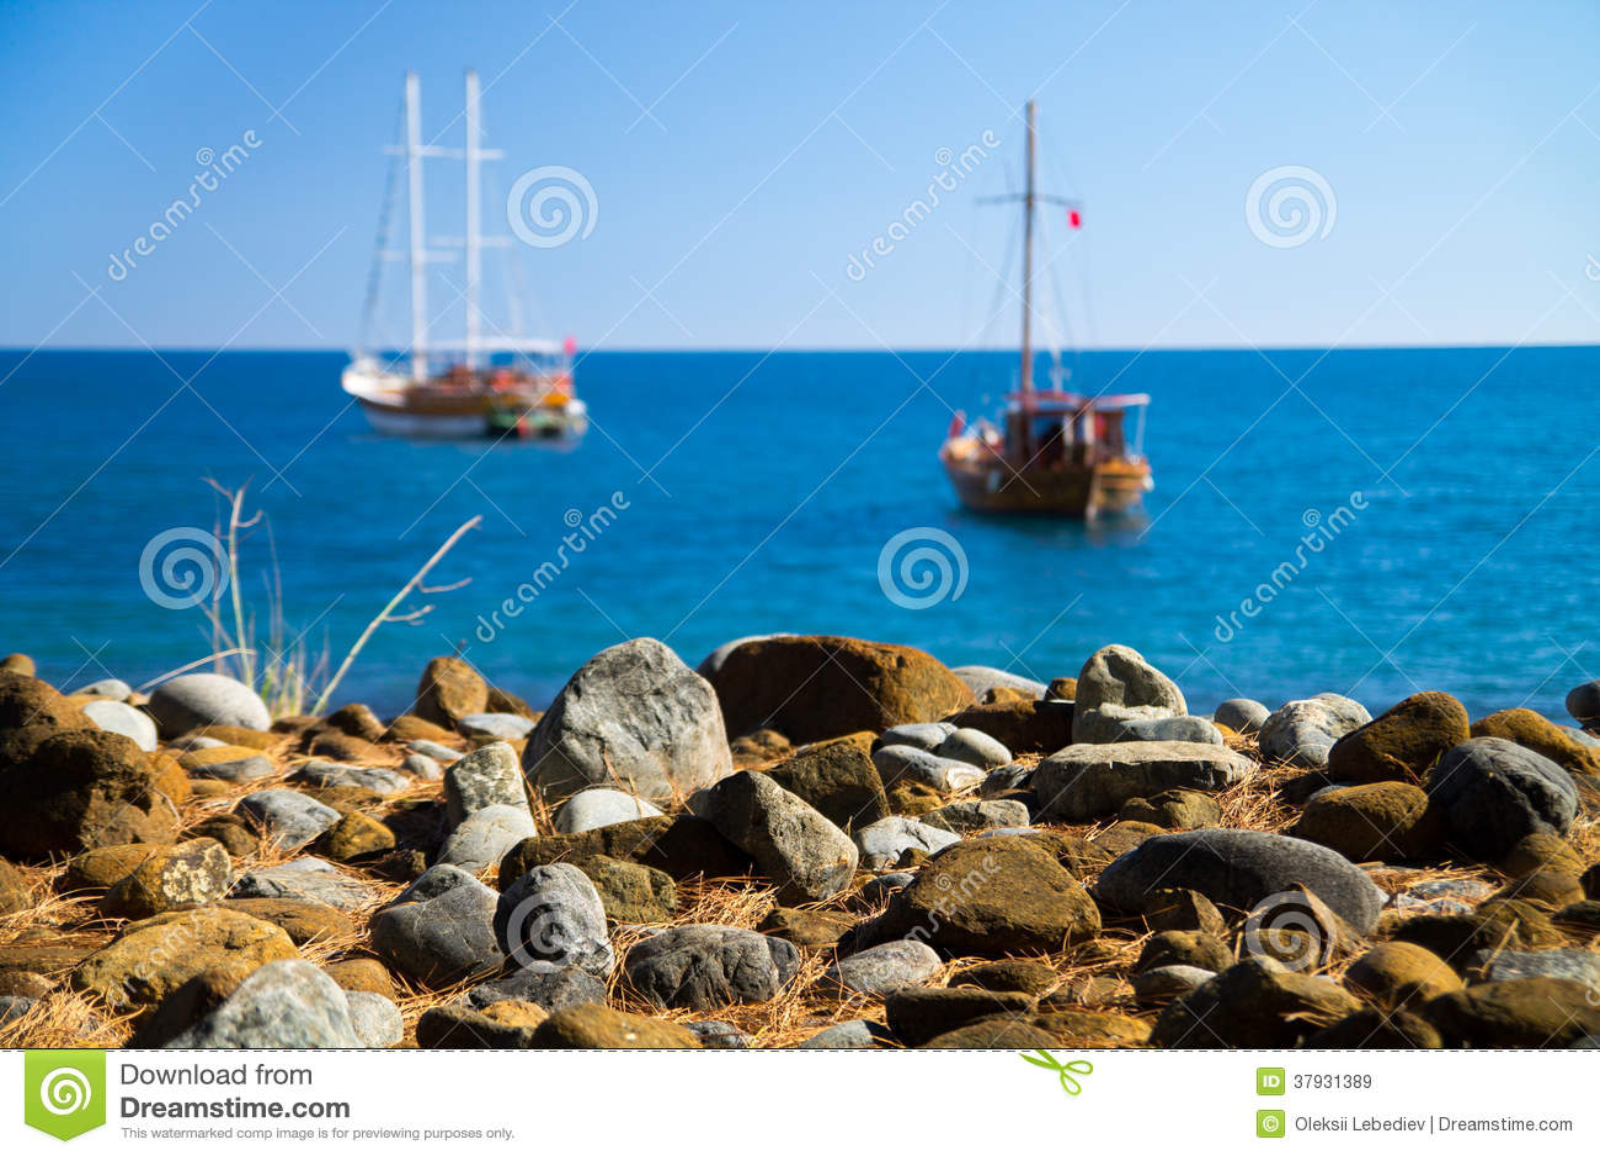 Яхты в заливе